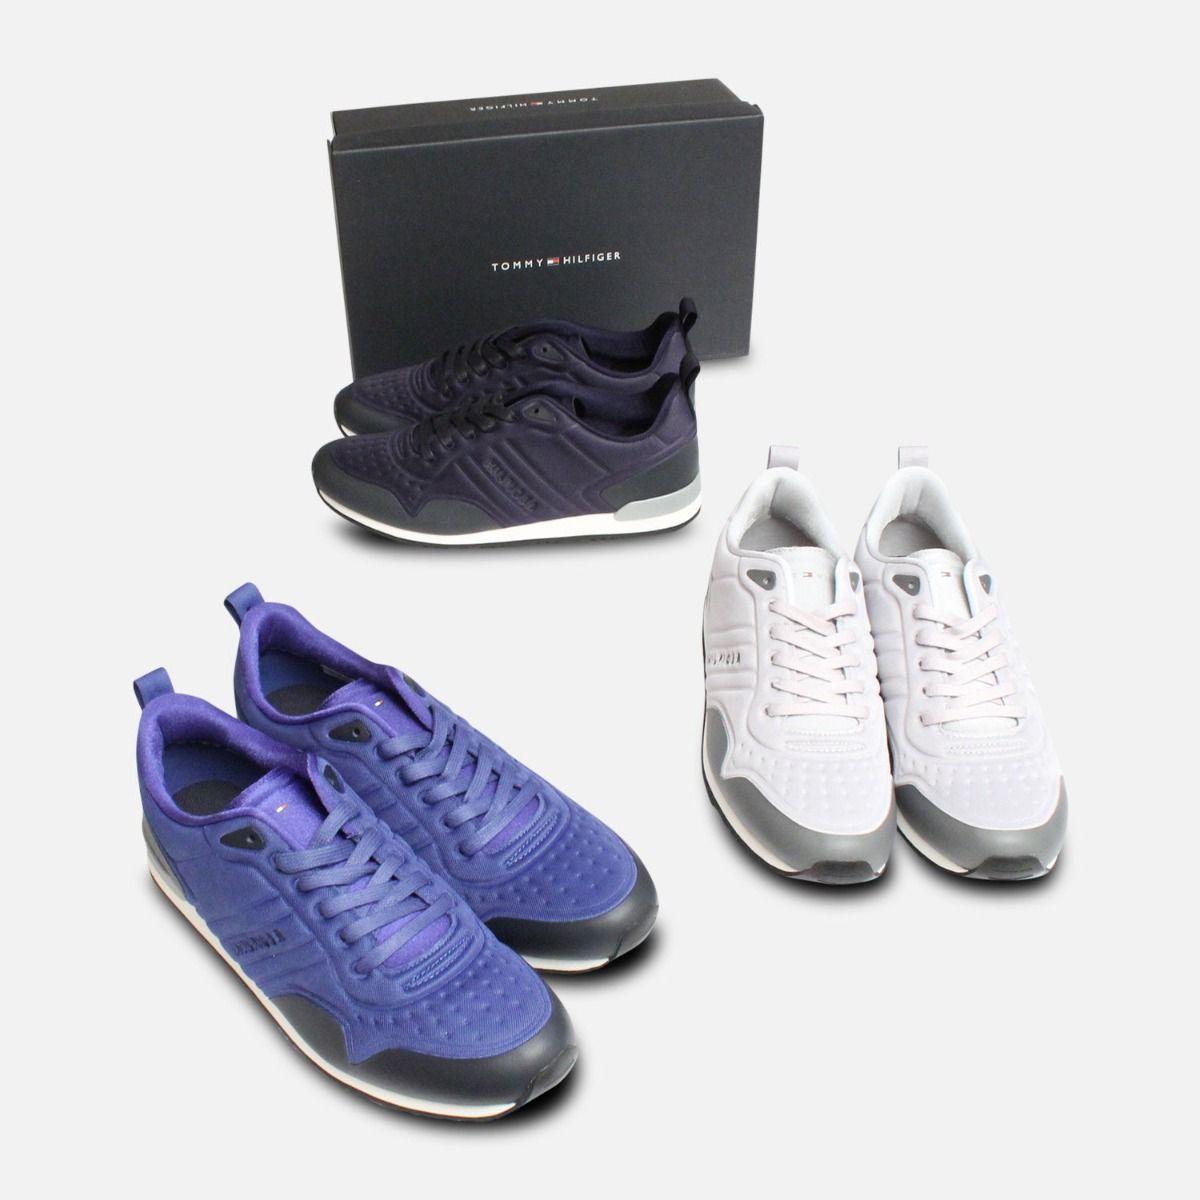 Monaco Blue Tommy Hilfiger Neoprene Designer Sneaker